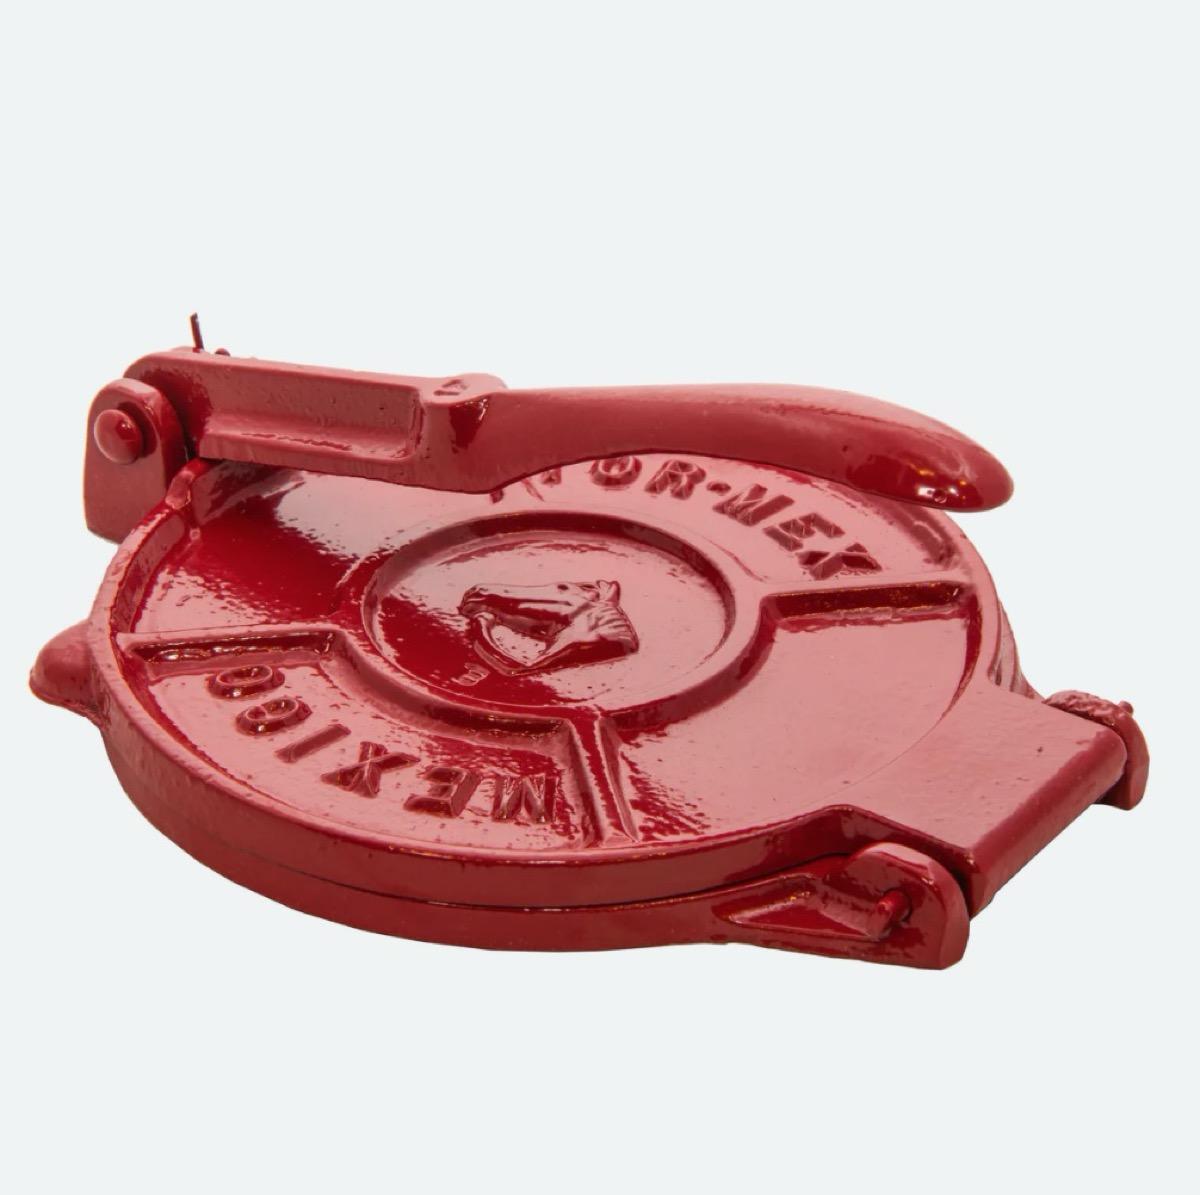 red tortilla press